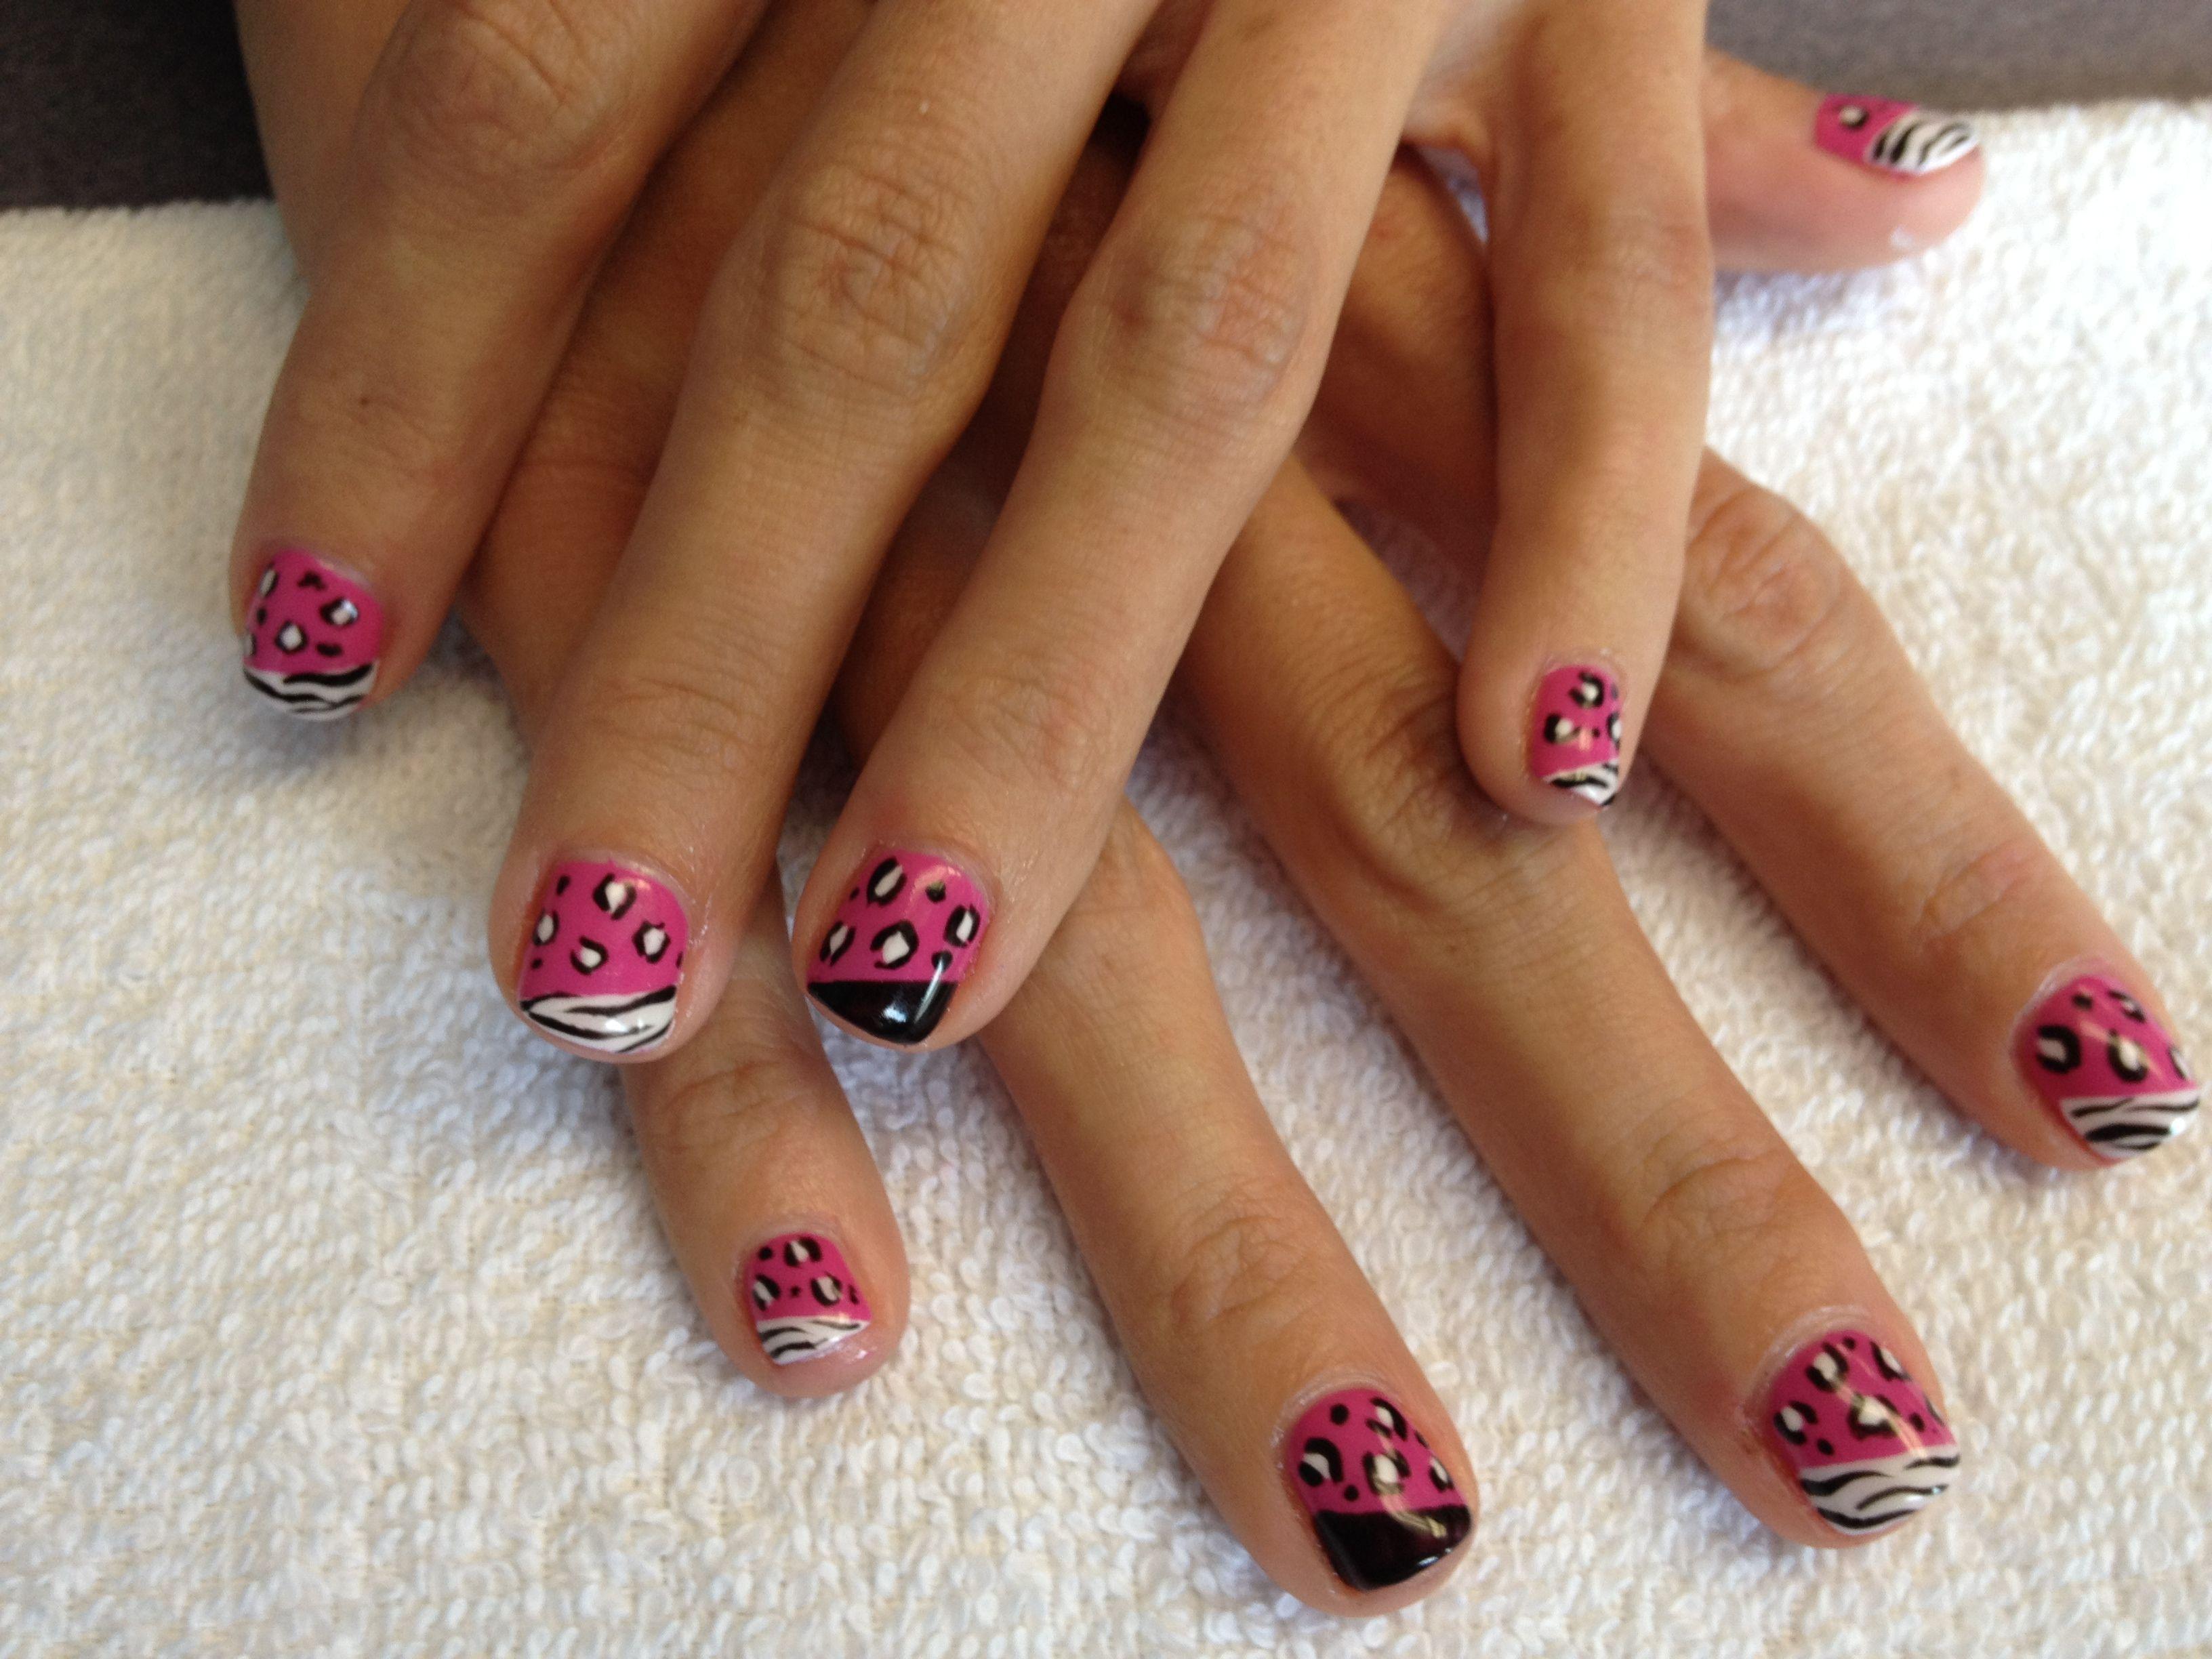 shellac nail design done by doshi doshi regan - Shellac Nail Design Ideas